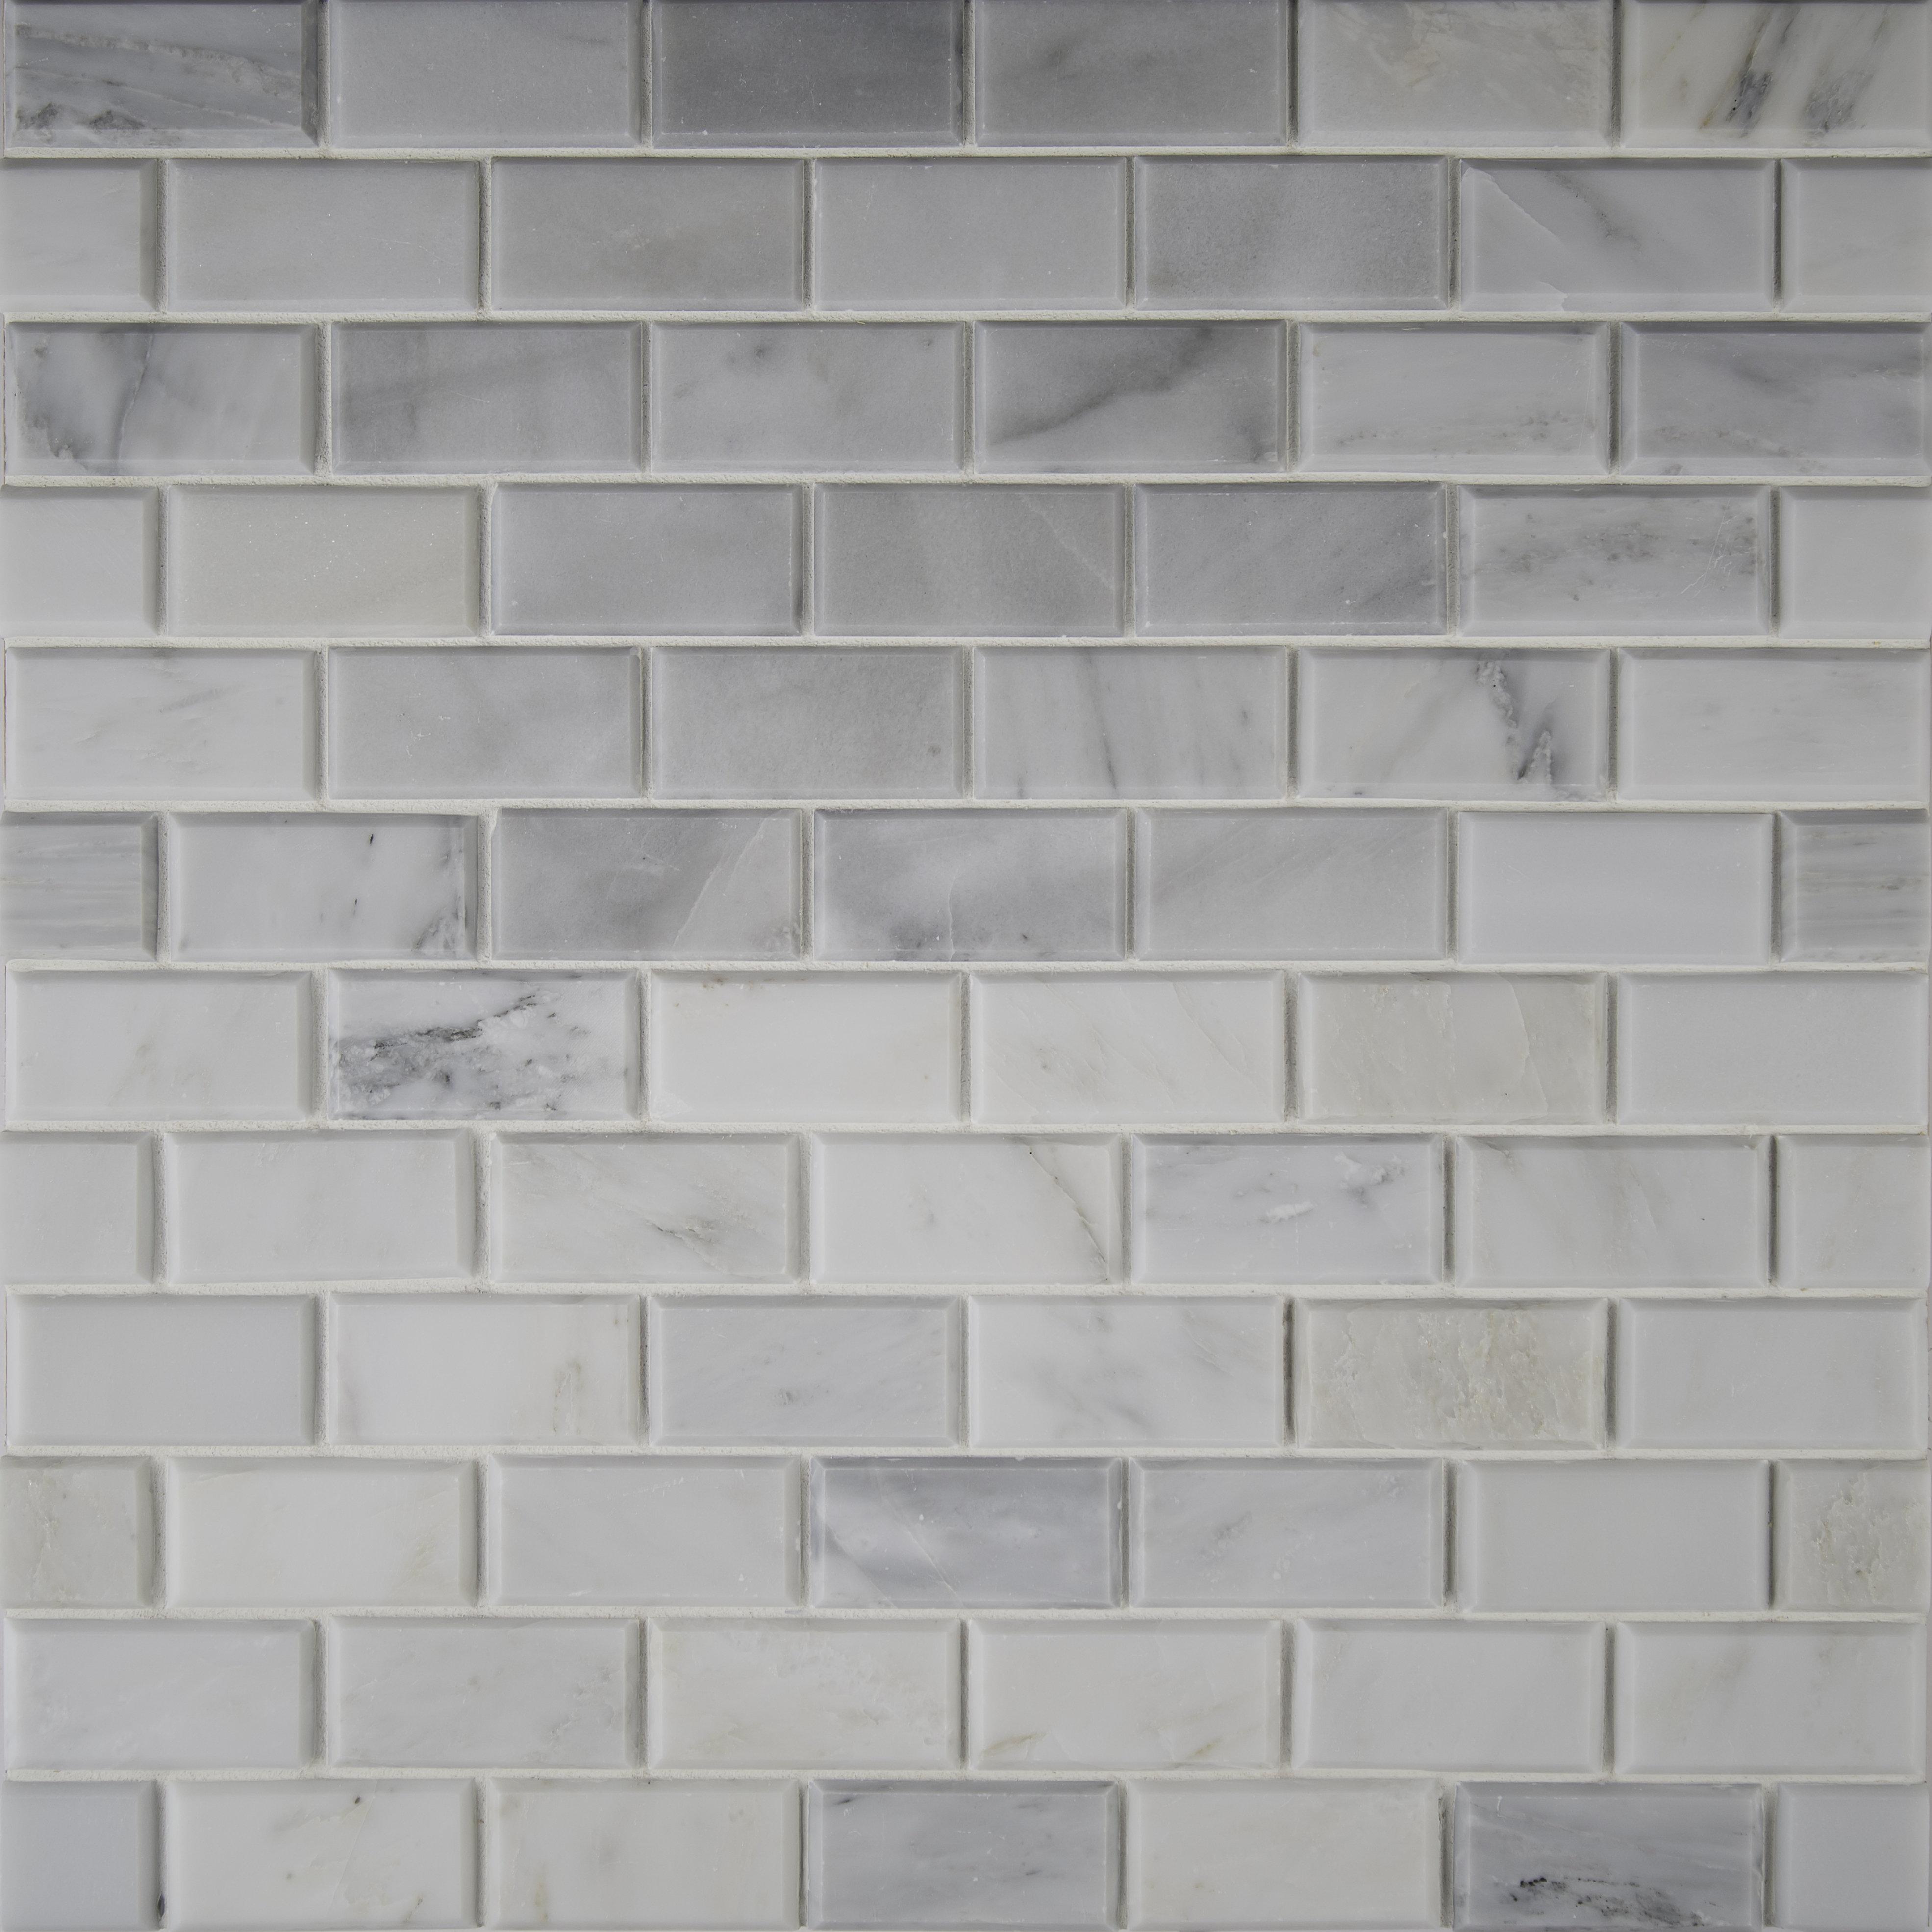 Msi Arabeo Carrara Greecian Mounted 2 X 4 Marble Mosaic Tile In White Reviews Wayfair